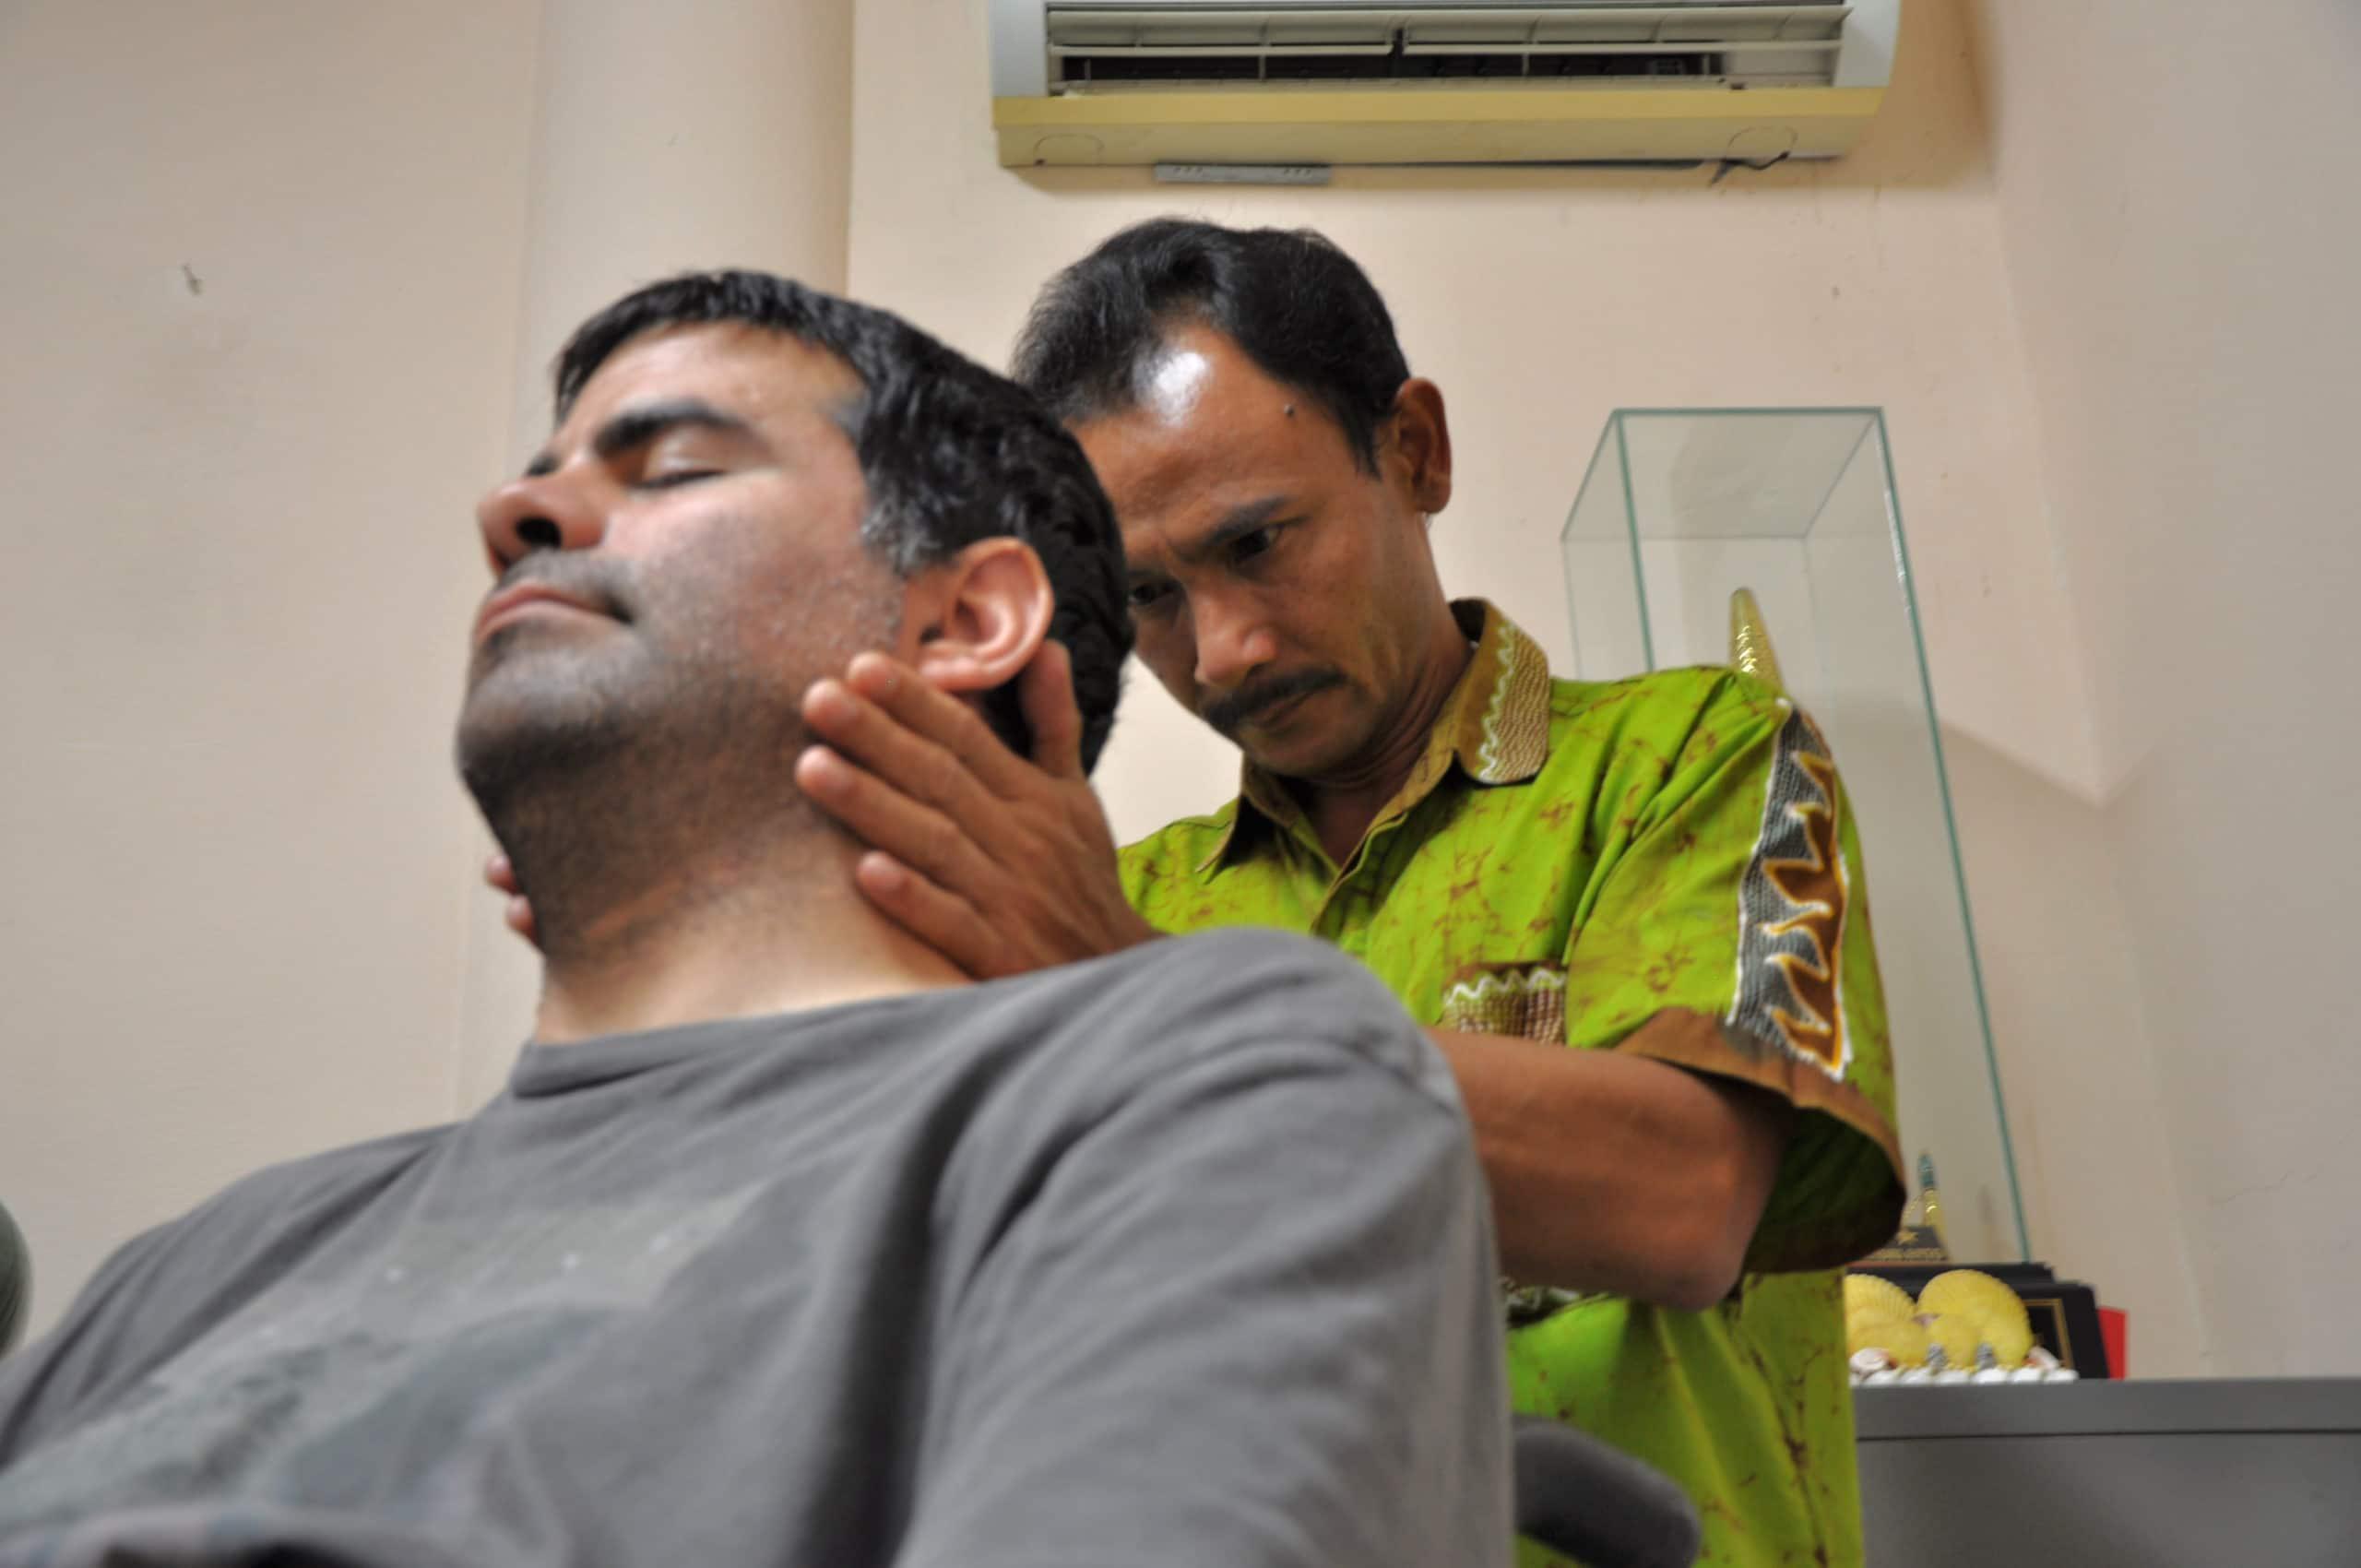 A Shaolin healer works on Minna's neck.